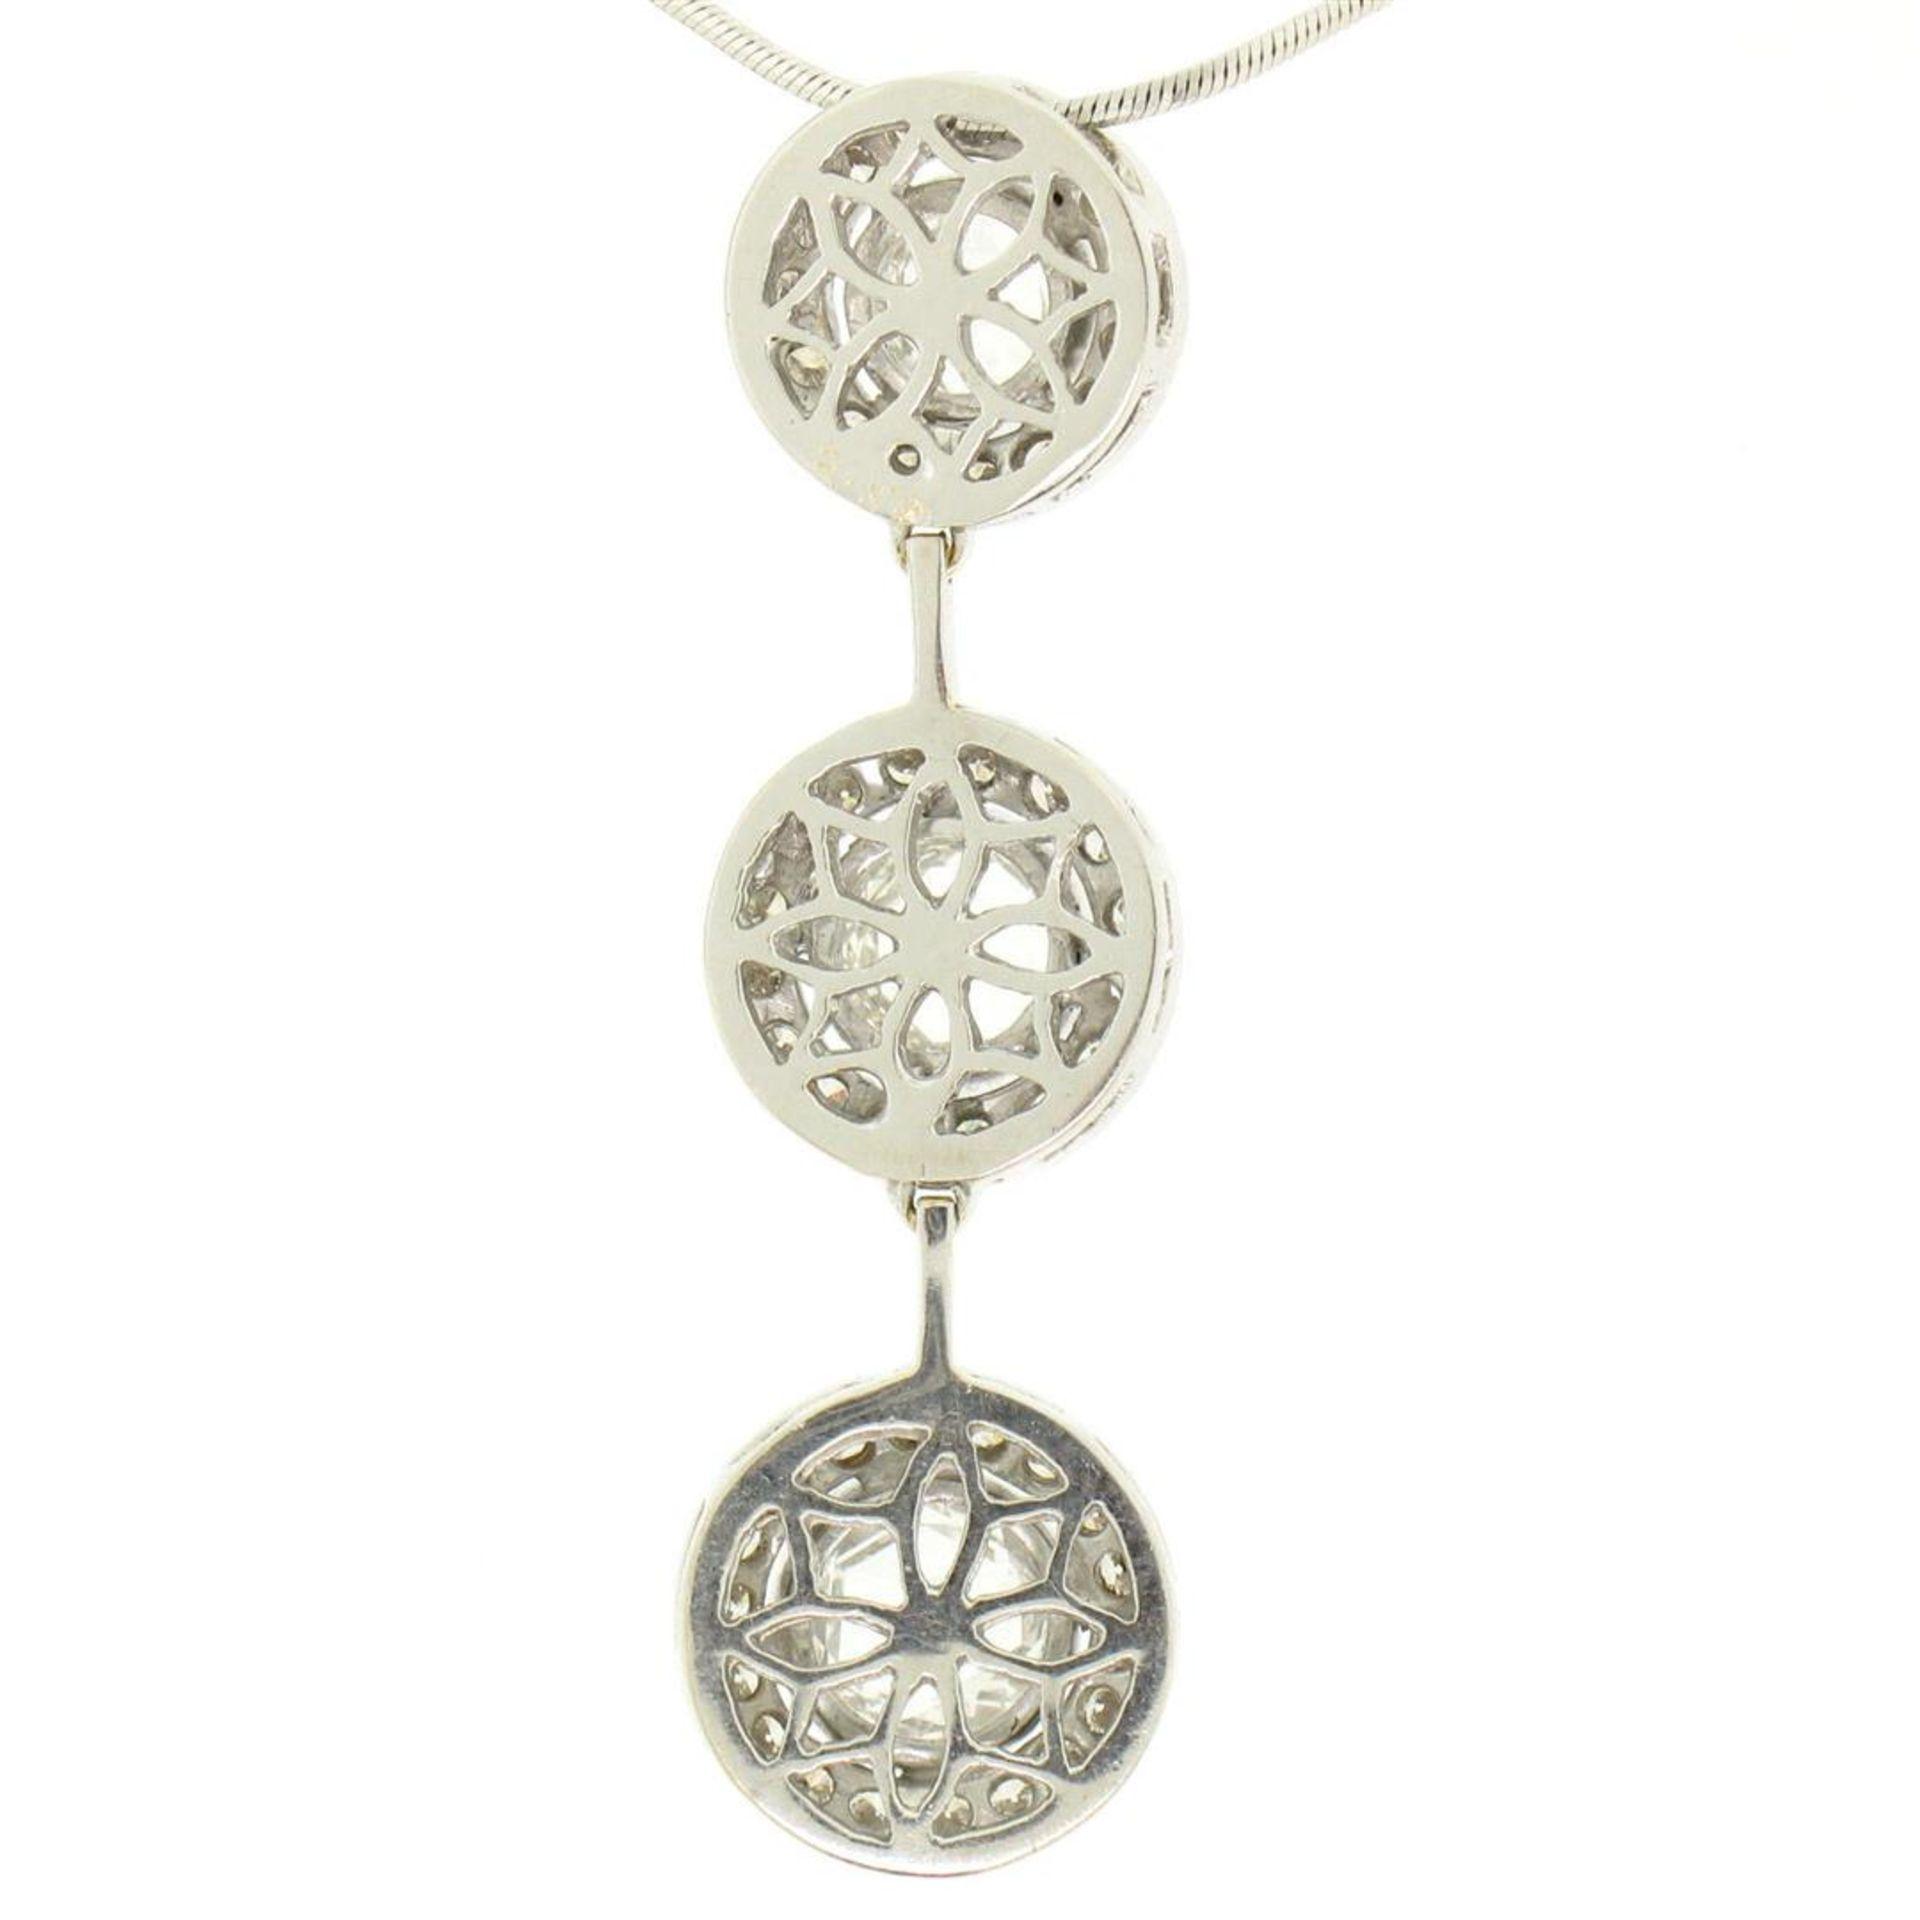 Vintage 18K White Gold 2.59 ctw 3 Rose Cut Diamond Drop Pendant w/ Triple Halo - Image 6 of 9